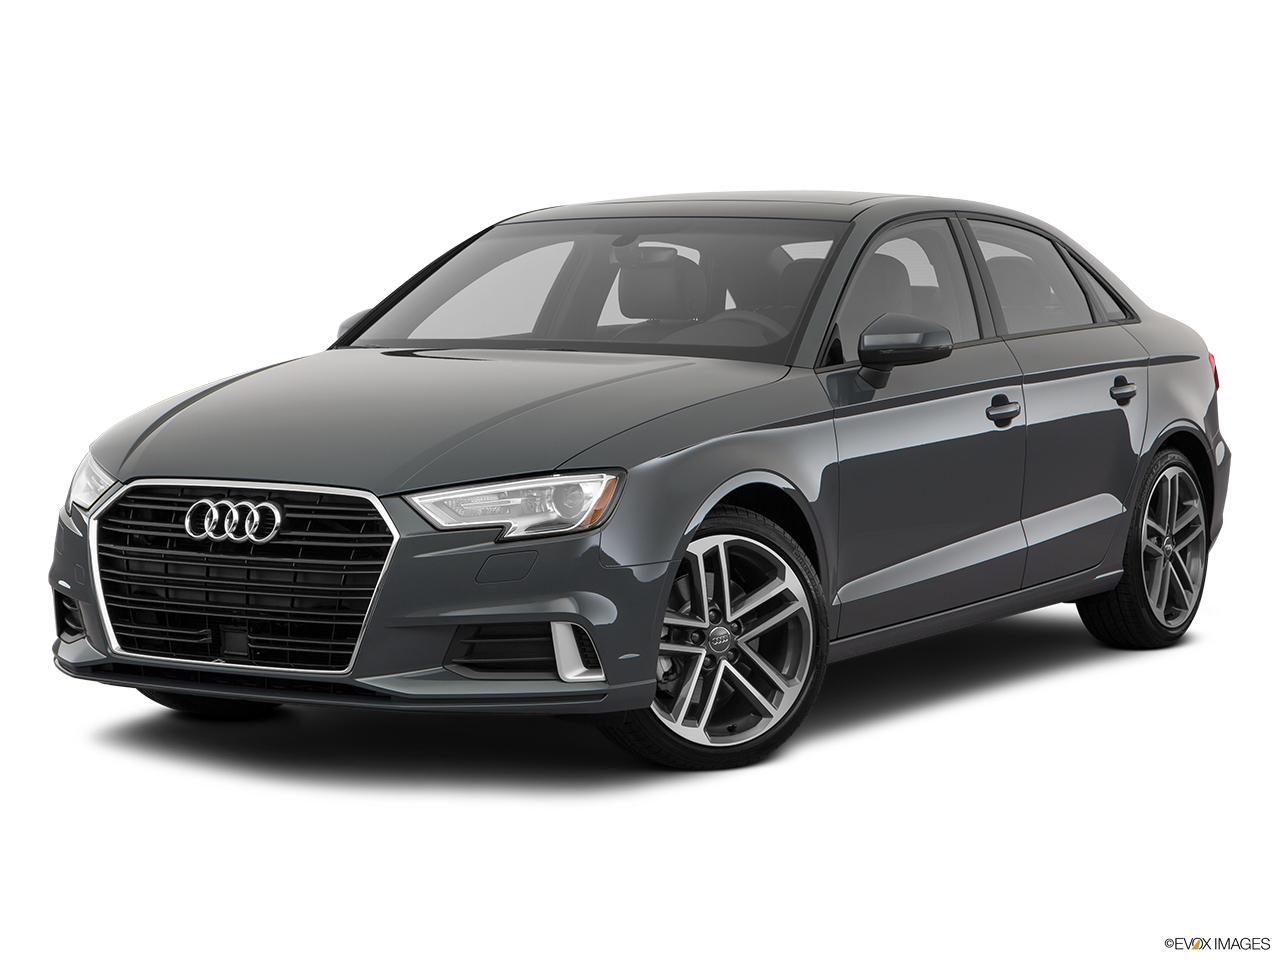 car pictures list for audi a3 sedan 2018 sport 40 2 0 tfsi 190 hp uae yallamotor. Black Bedroom Furniture Sets. Home Design Ideas